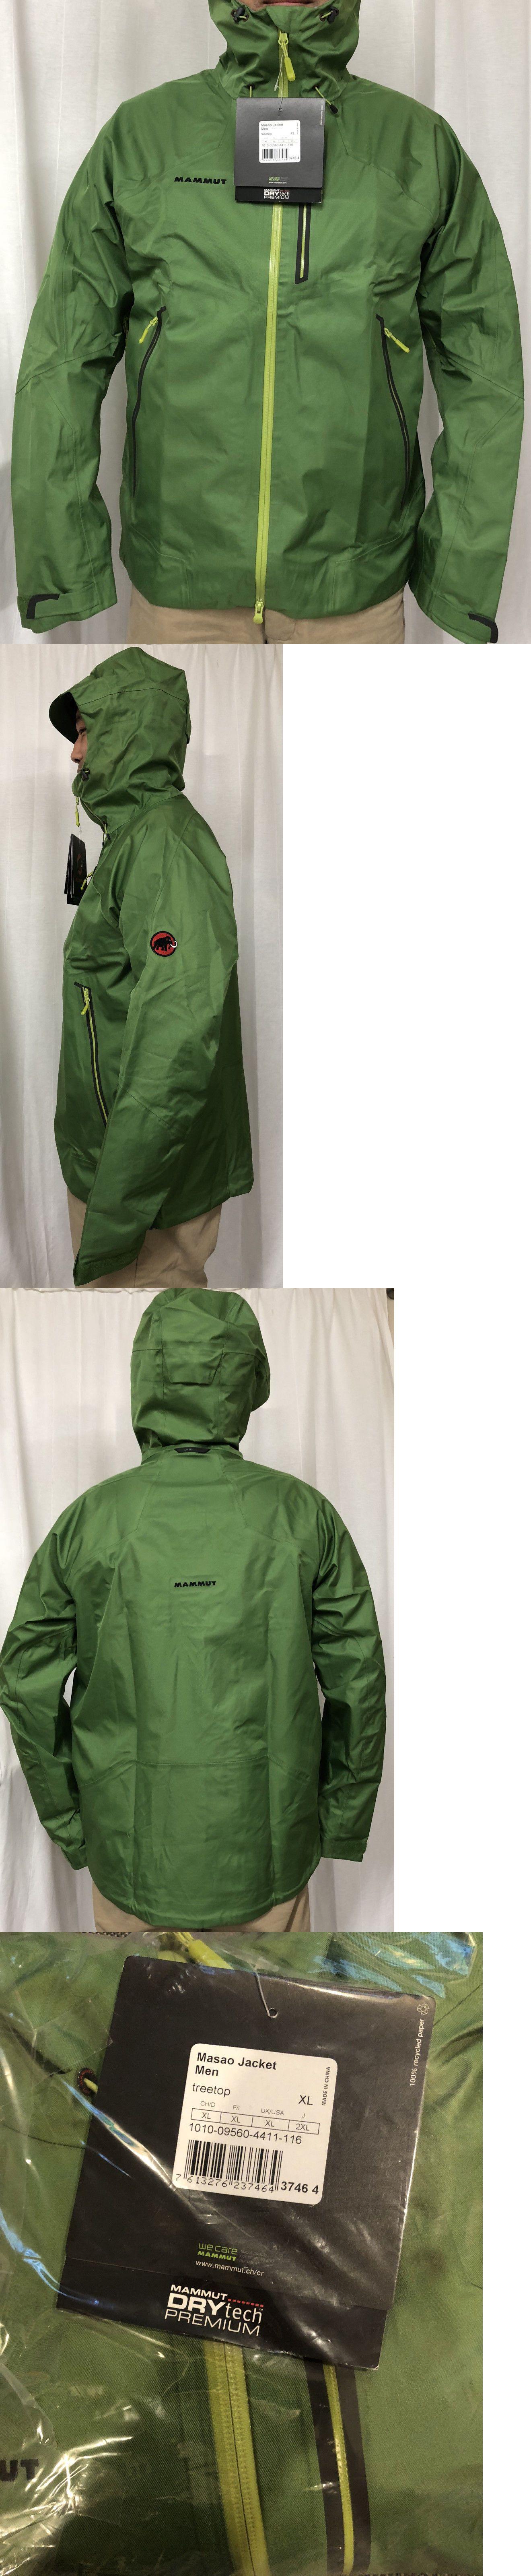 Mammut jacket made in china